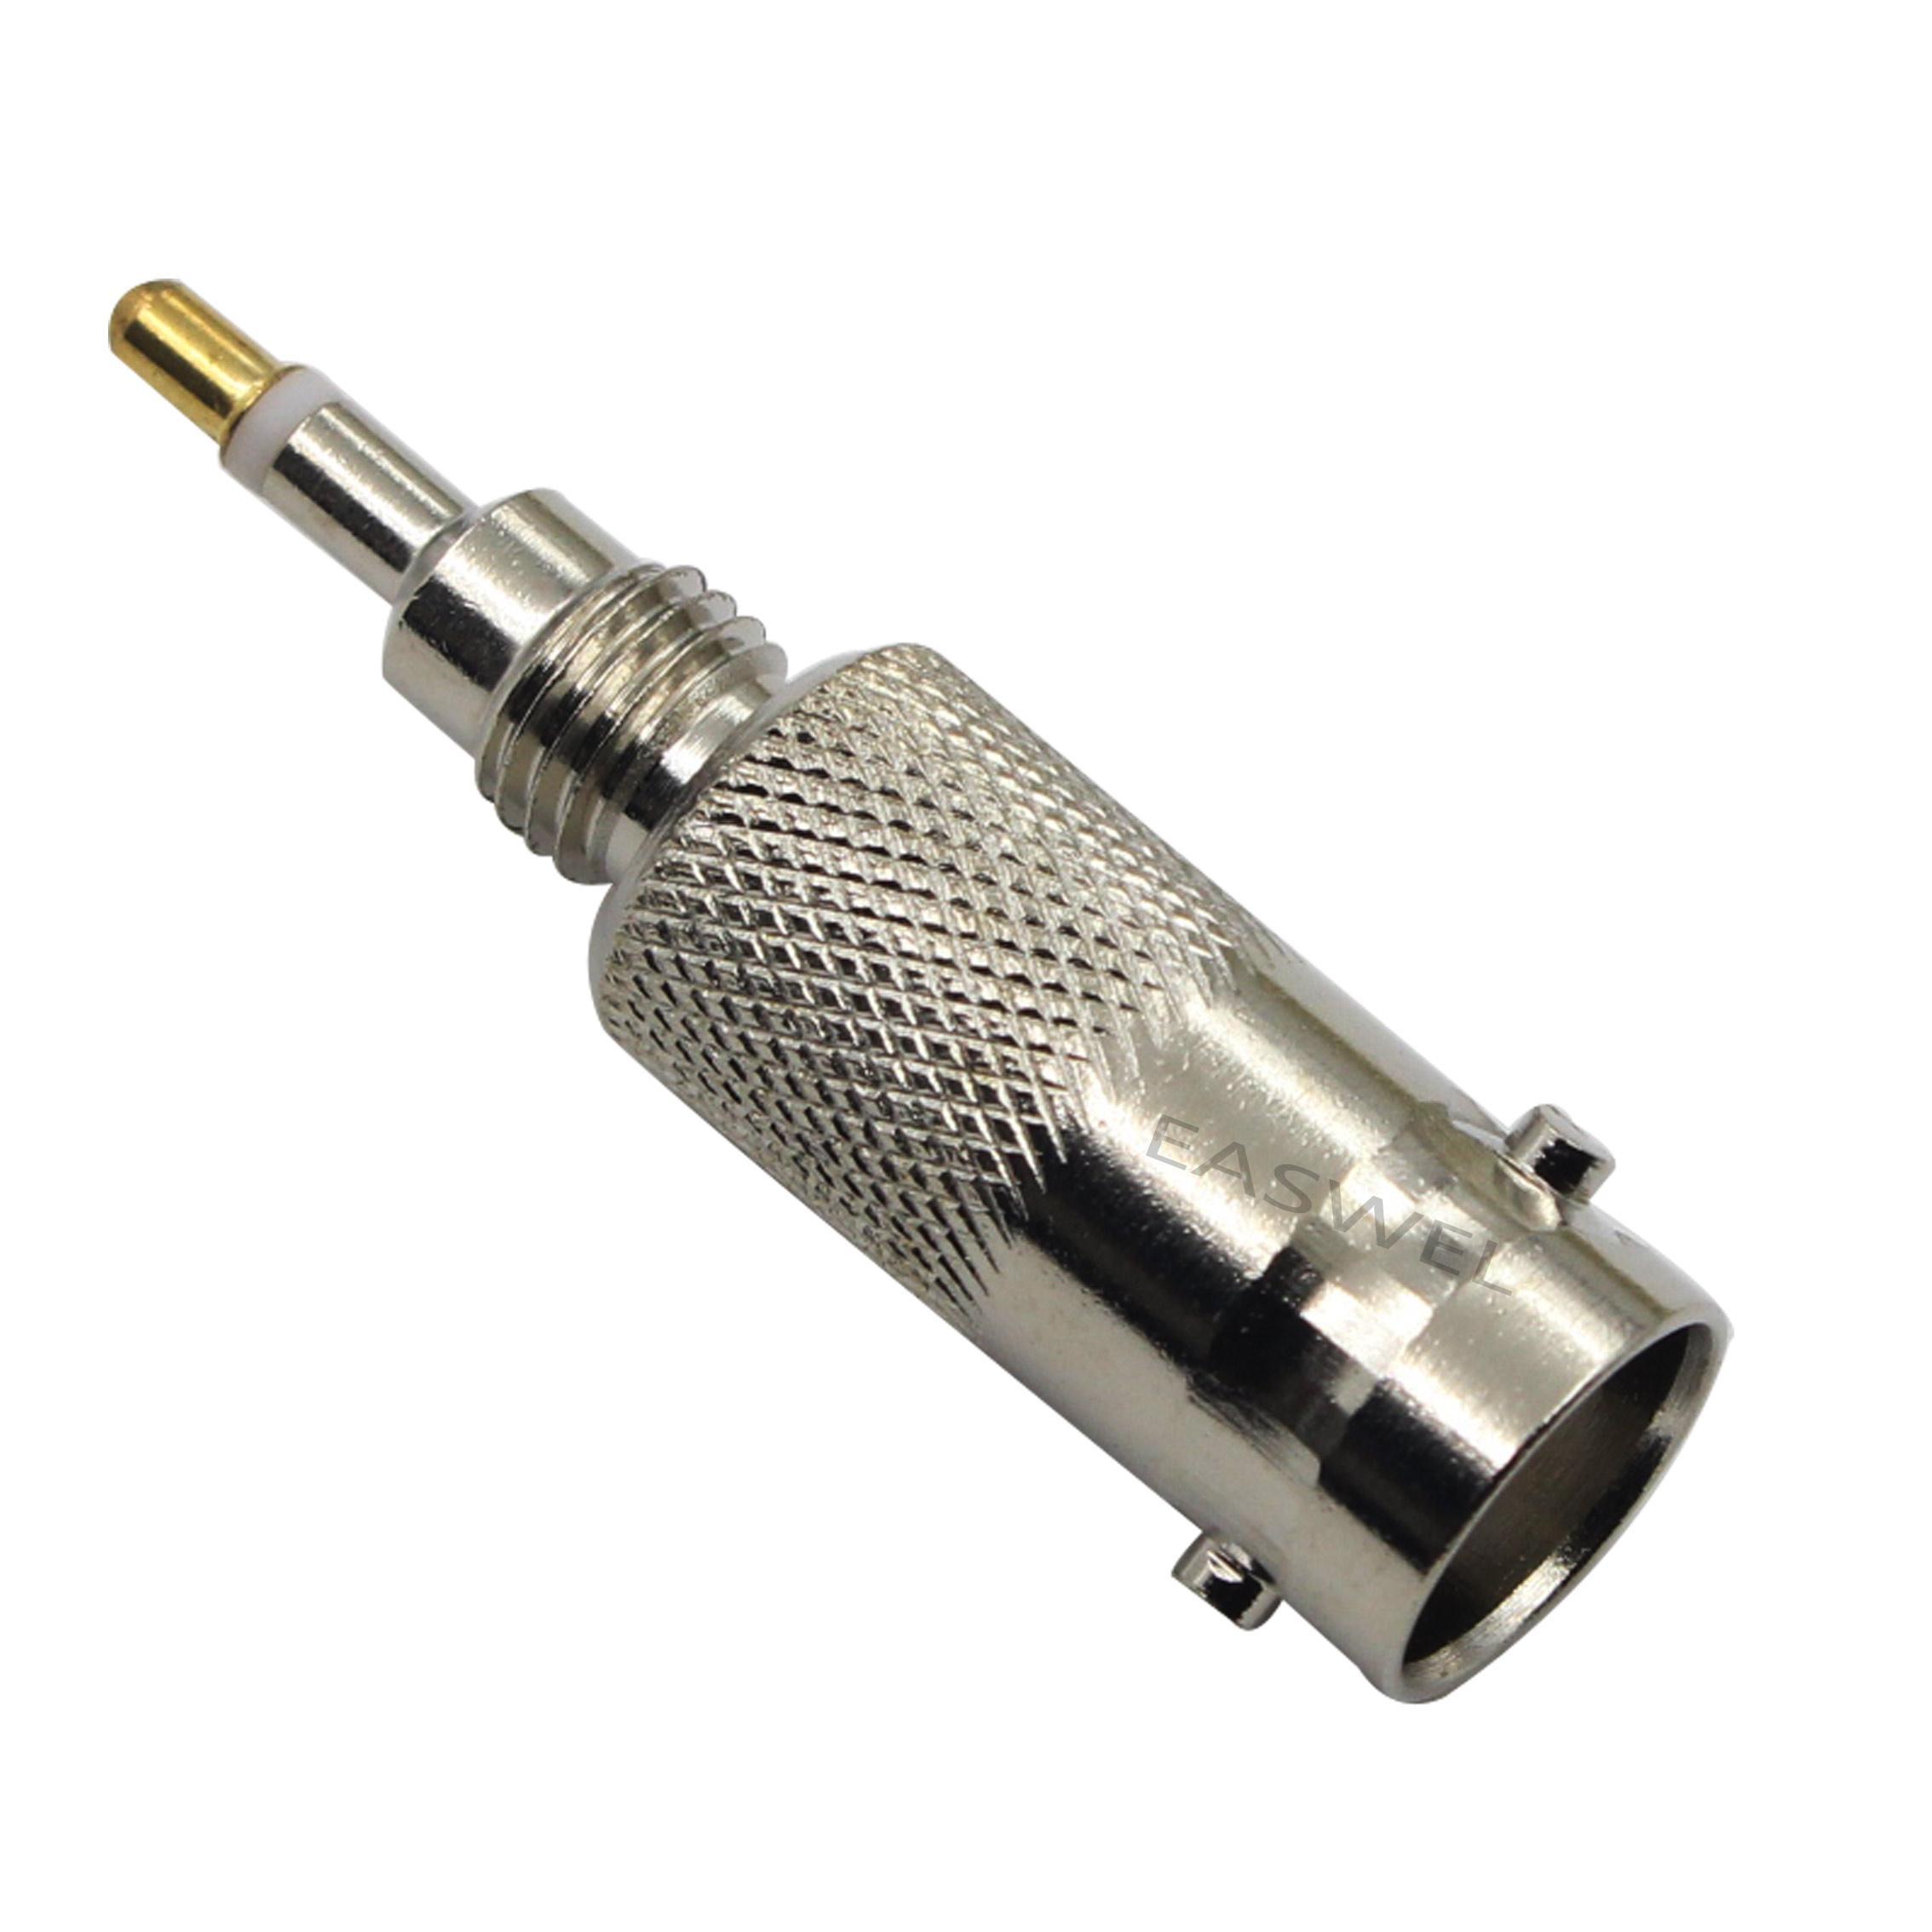 BNC Antenna Adapter for Motorola Radio GP300 HT750/1250 EX600 GP68